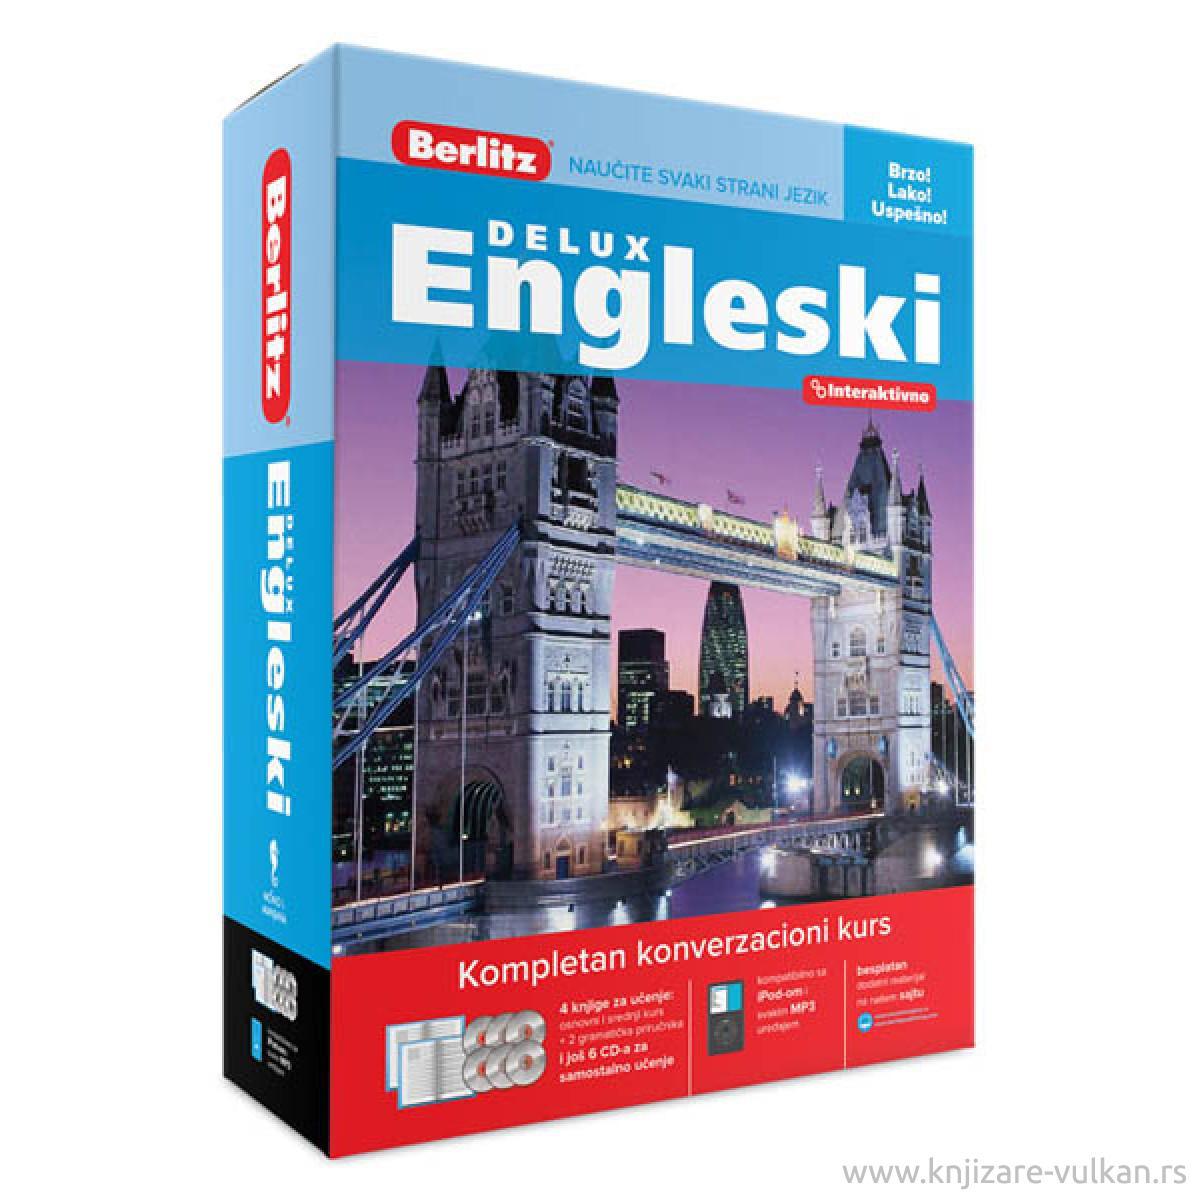 BERLITZ: DELUX ENGLESKI